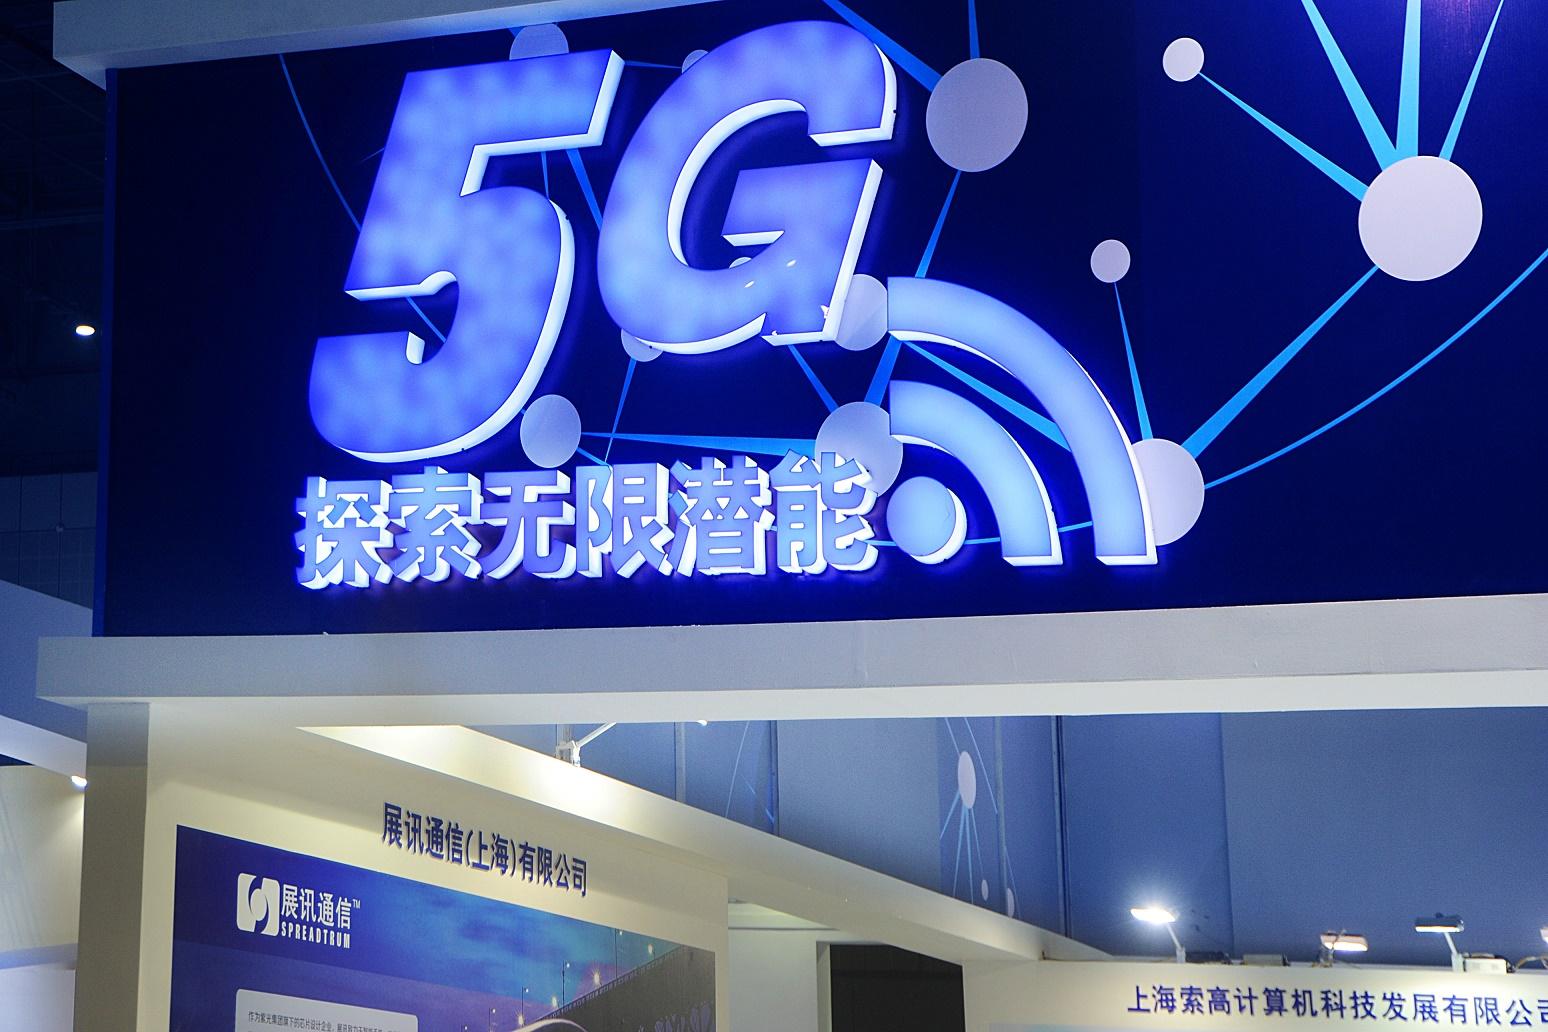 A tecnologia 5G está na base desse novo desenho de futuro. Foto Zhu lan / Imaginechina